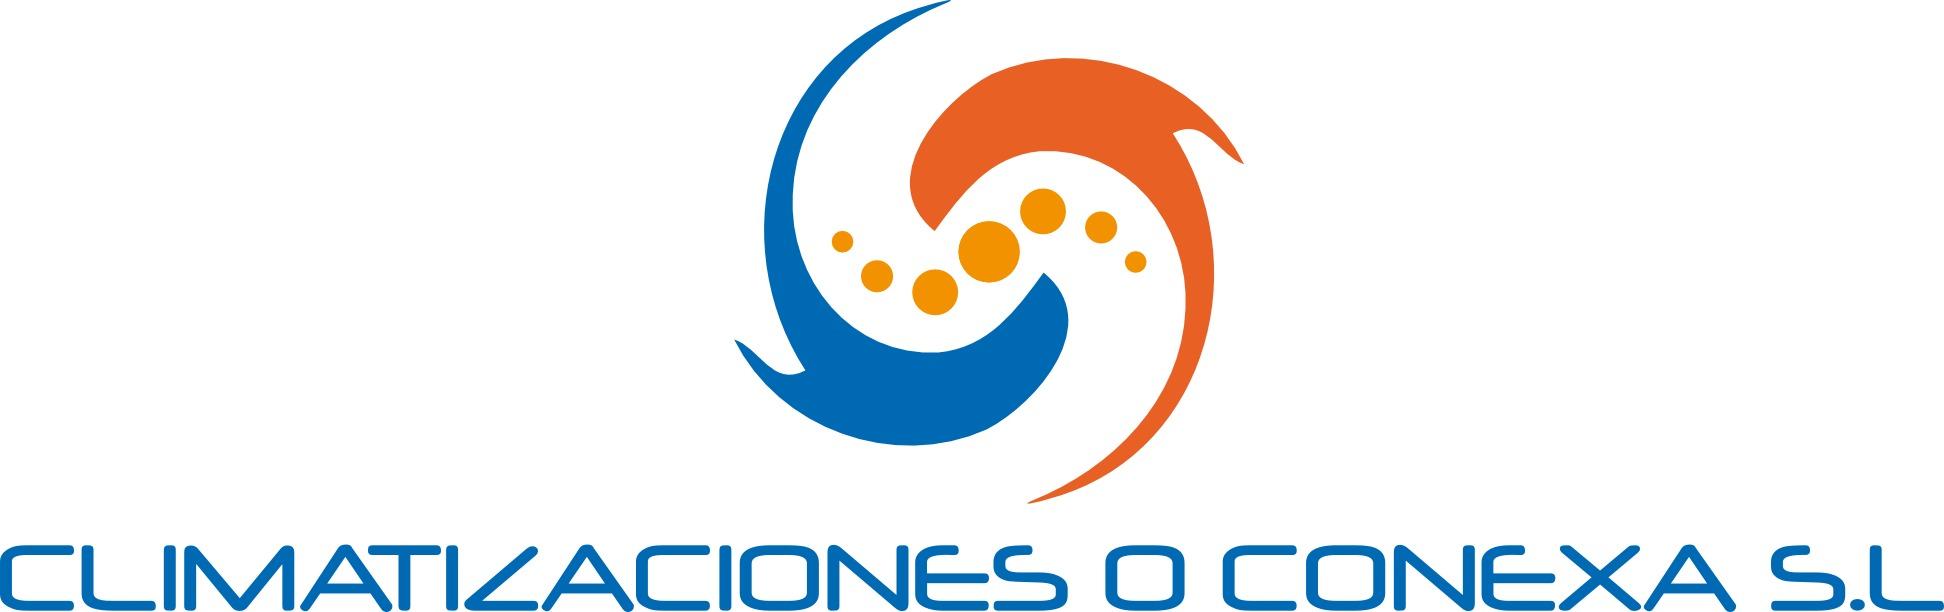 Climatizaciones O. Conexa S.l.